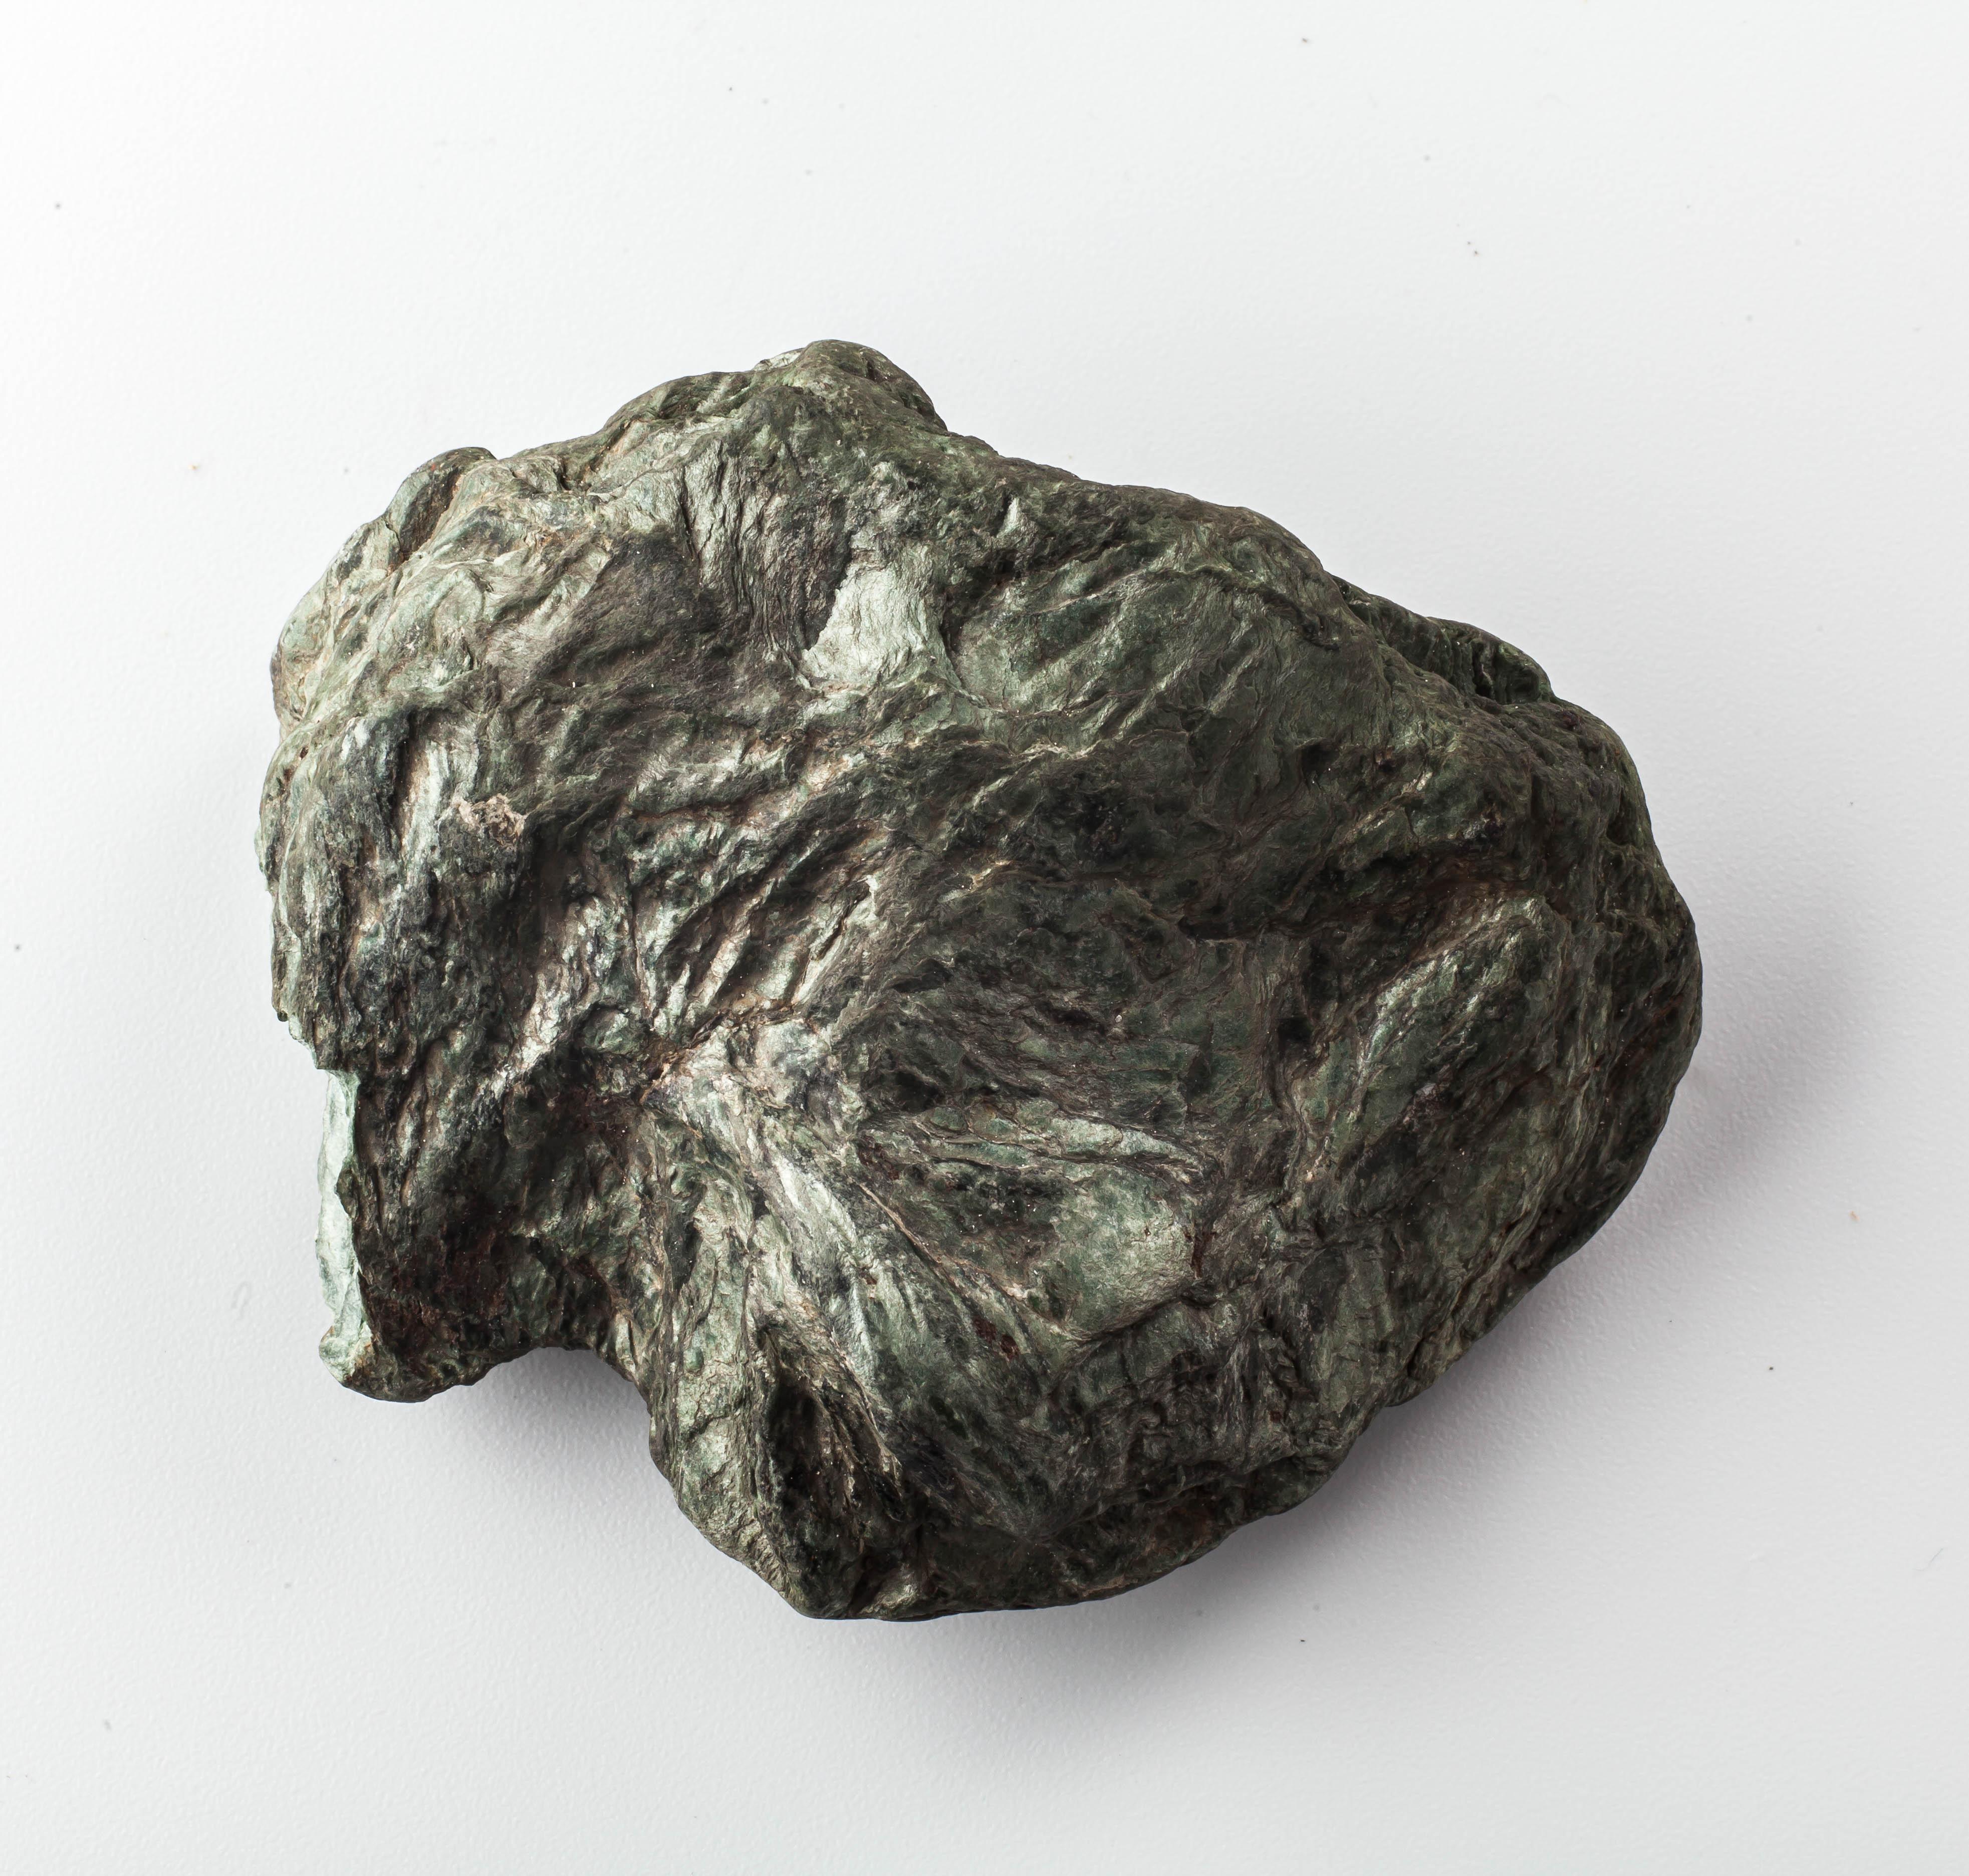 IES_SANISIDRO_MUSEO_Geologia_007